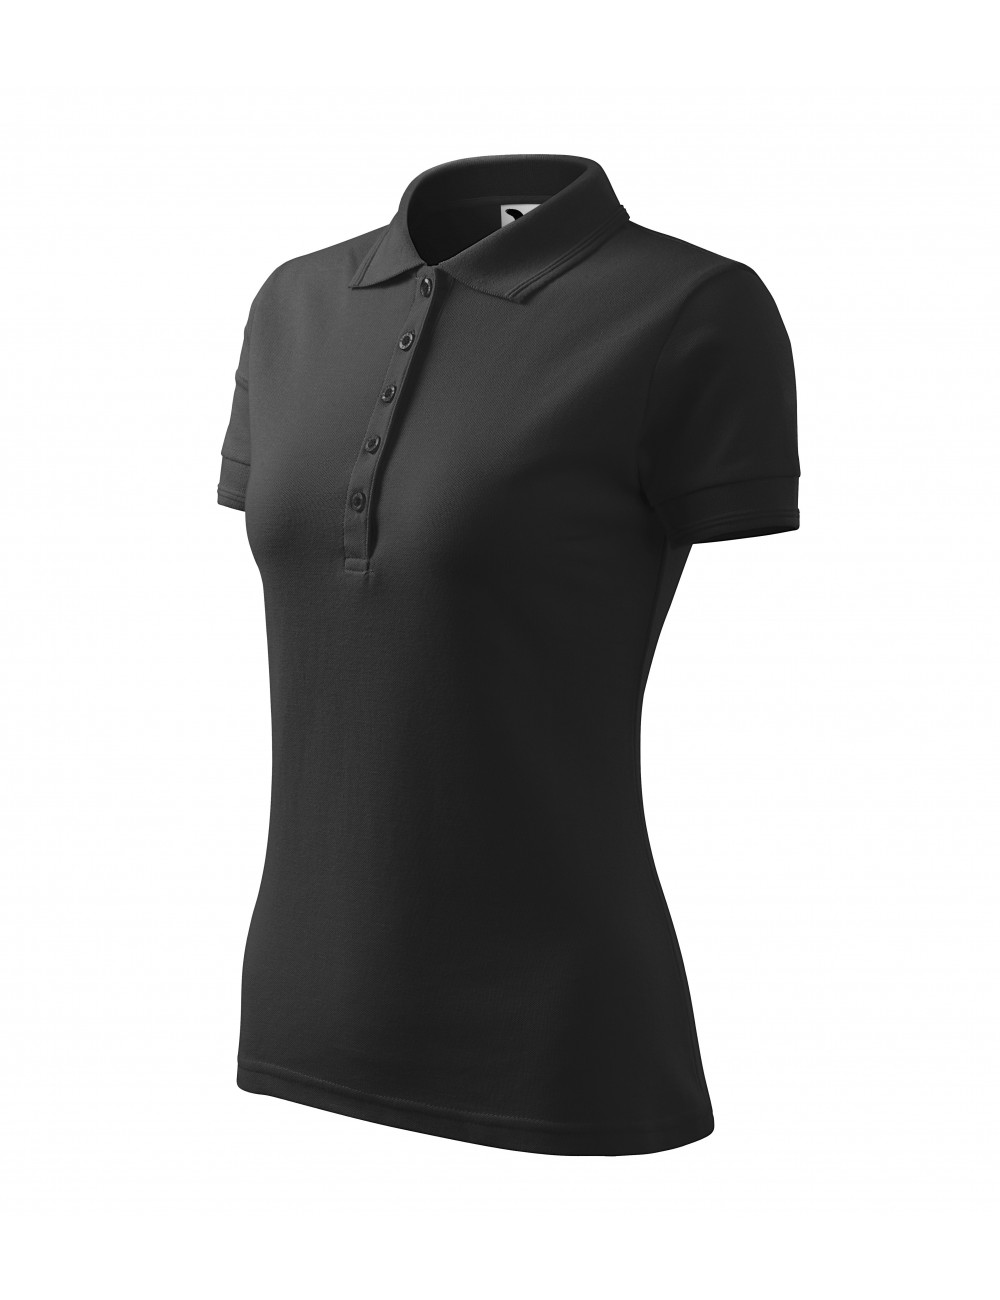 Adler MALFINI Koszulka polo damska Pique Polo 210 antracytowy melanż